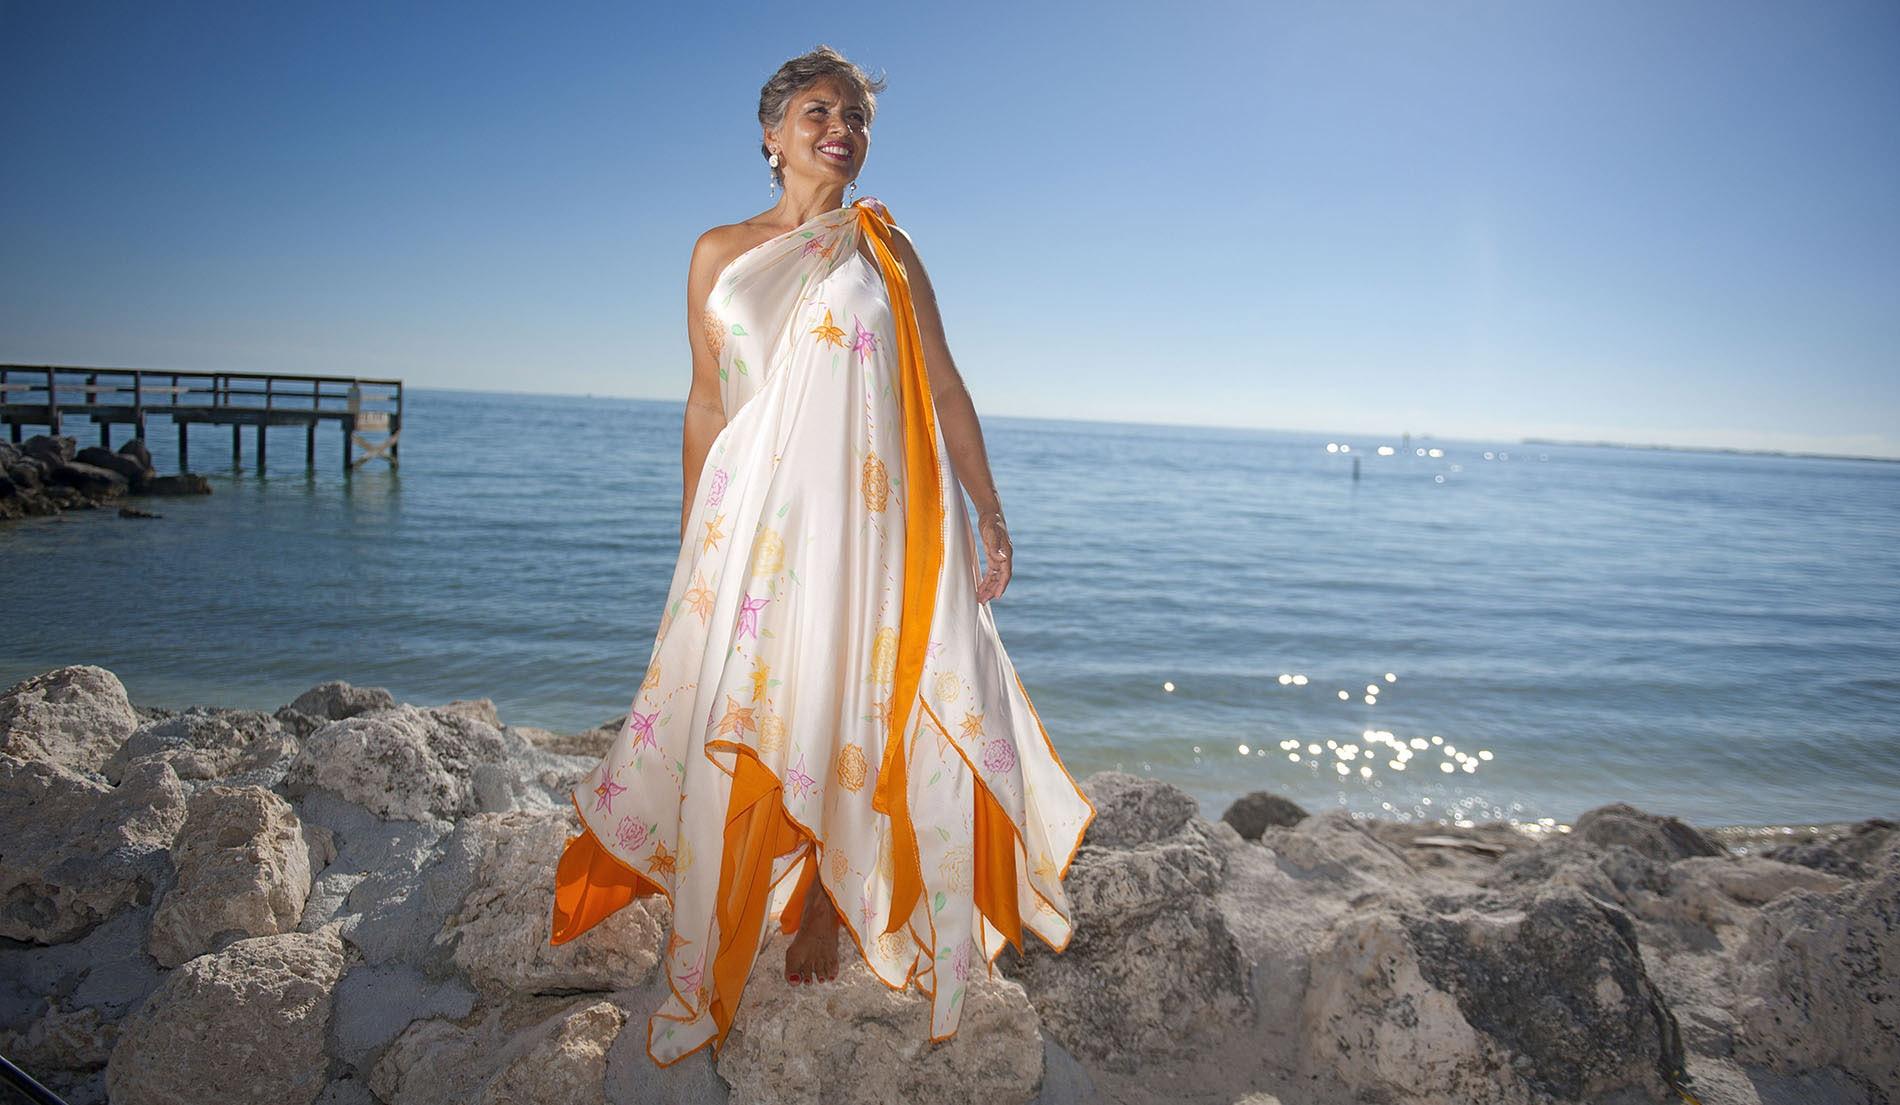 Handprinted Beach Inspired Wedding Dresses - look 7 front